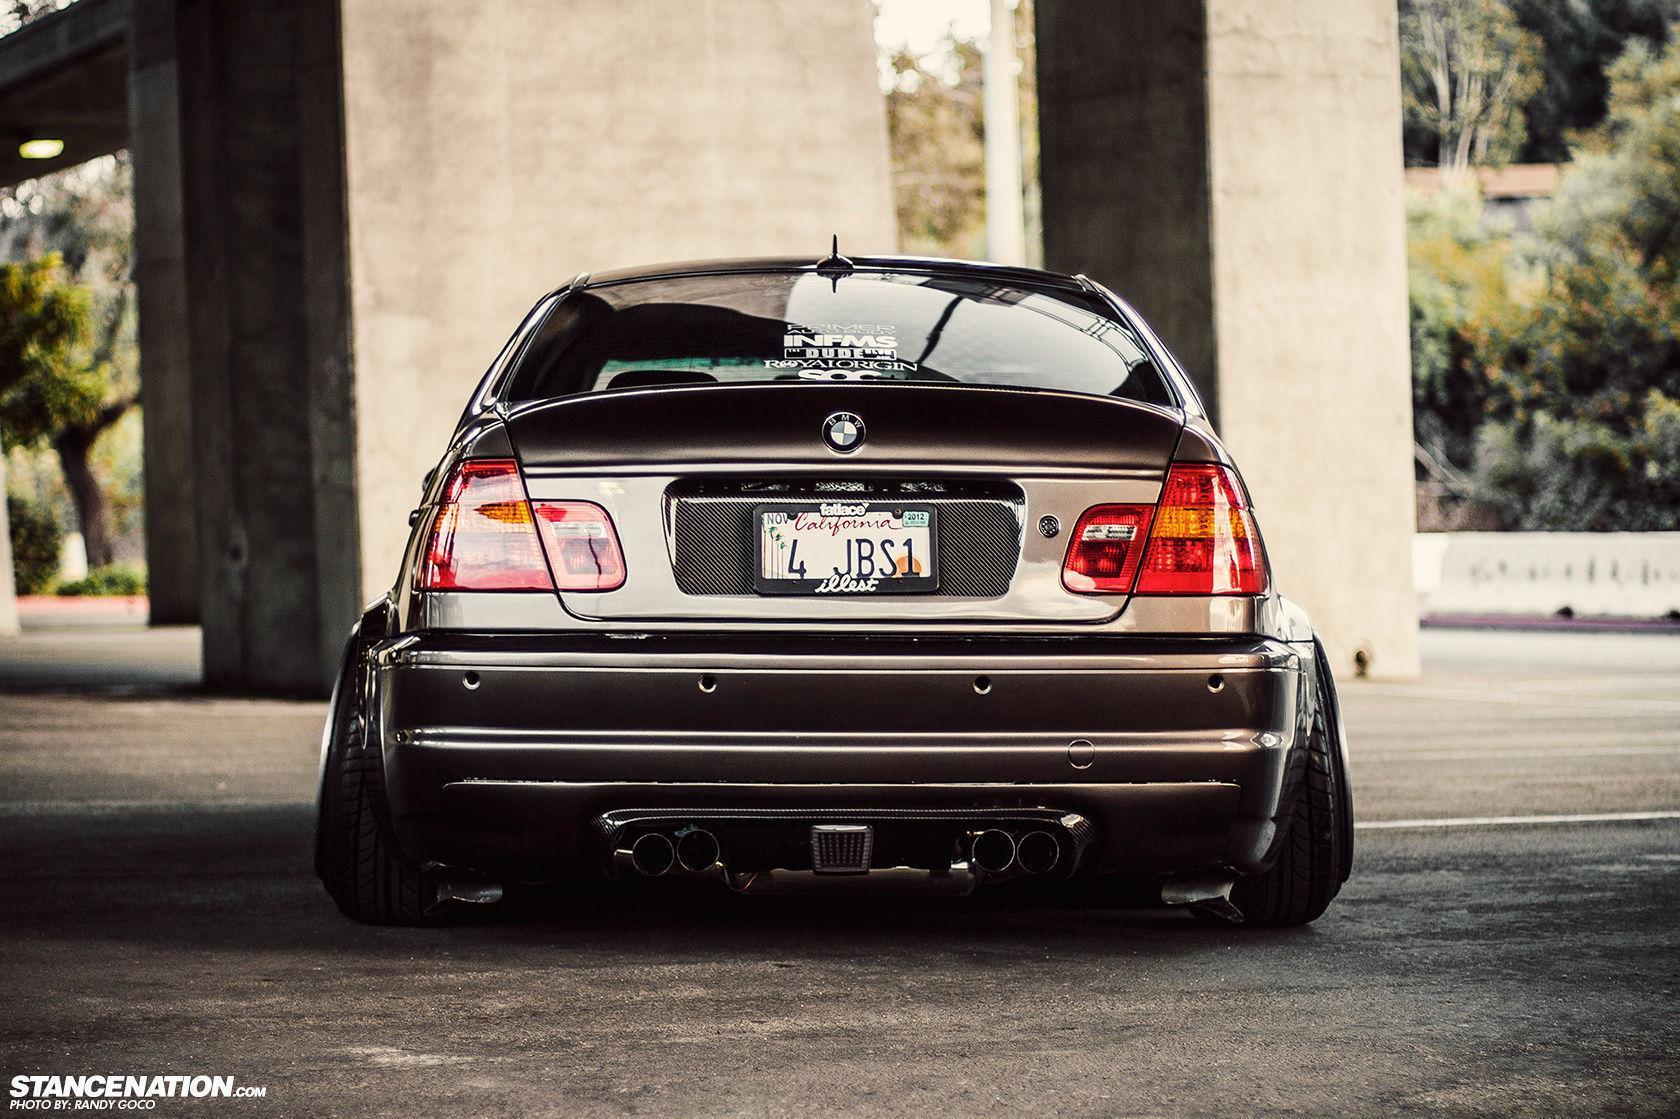 2003 BMW M3 | BMW E46 M3